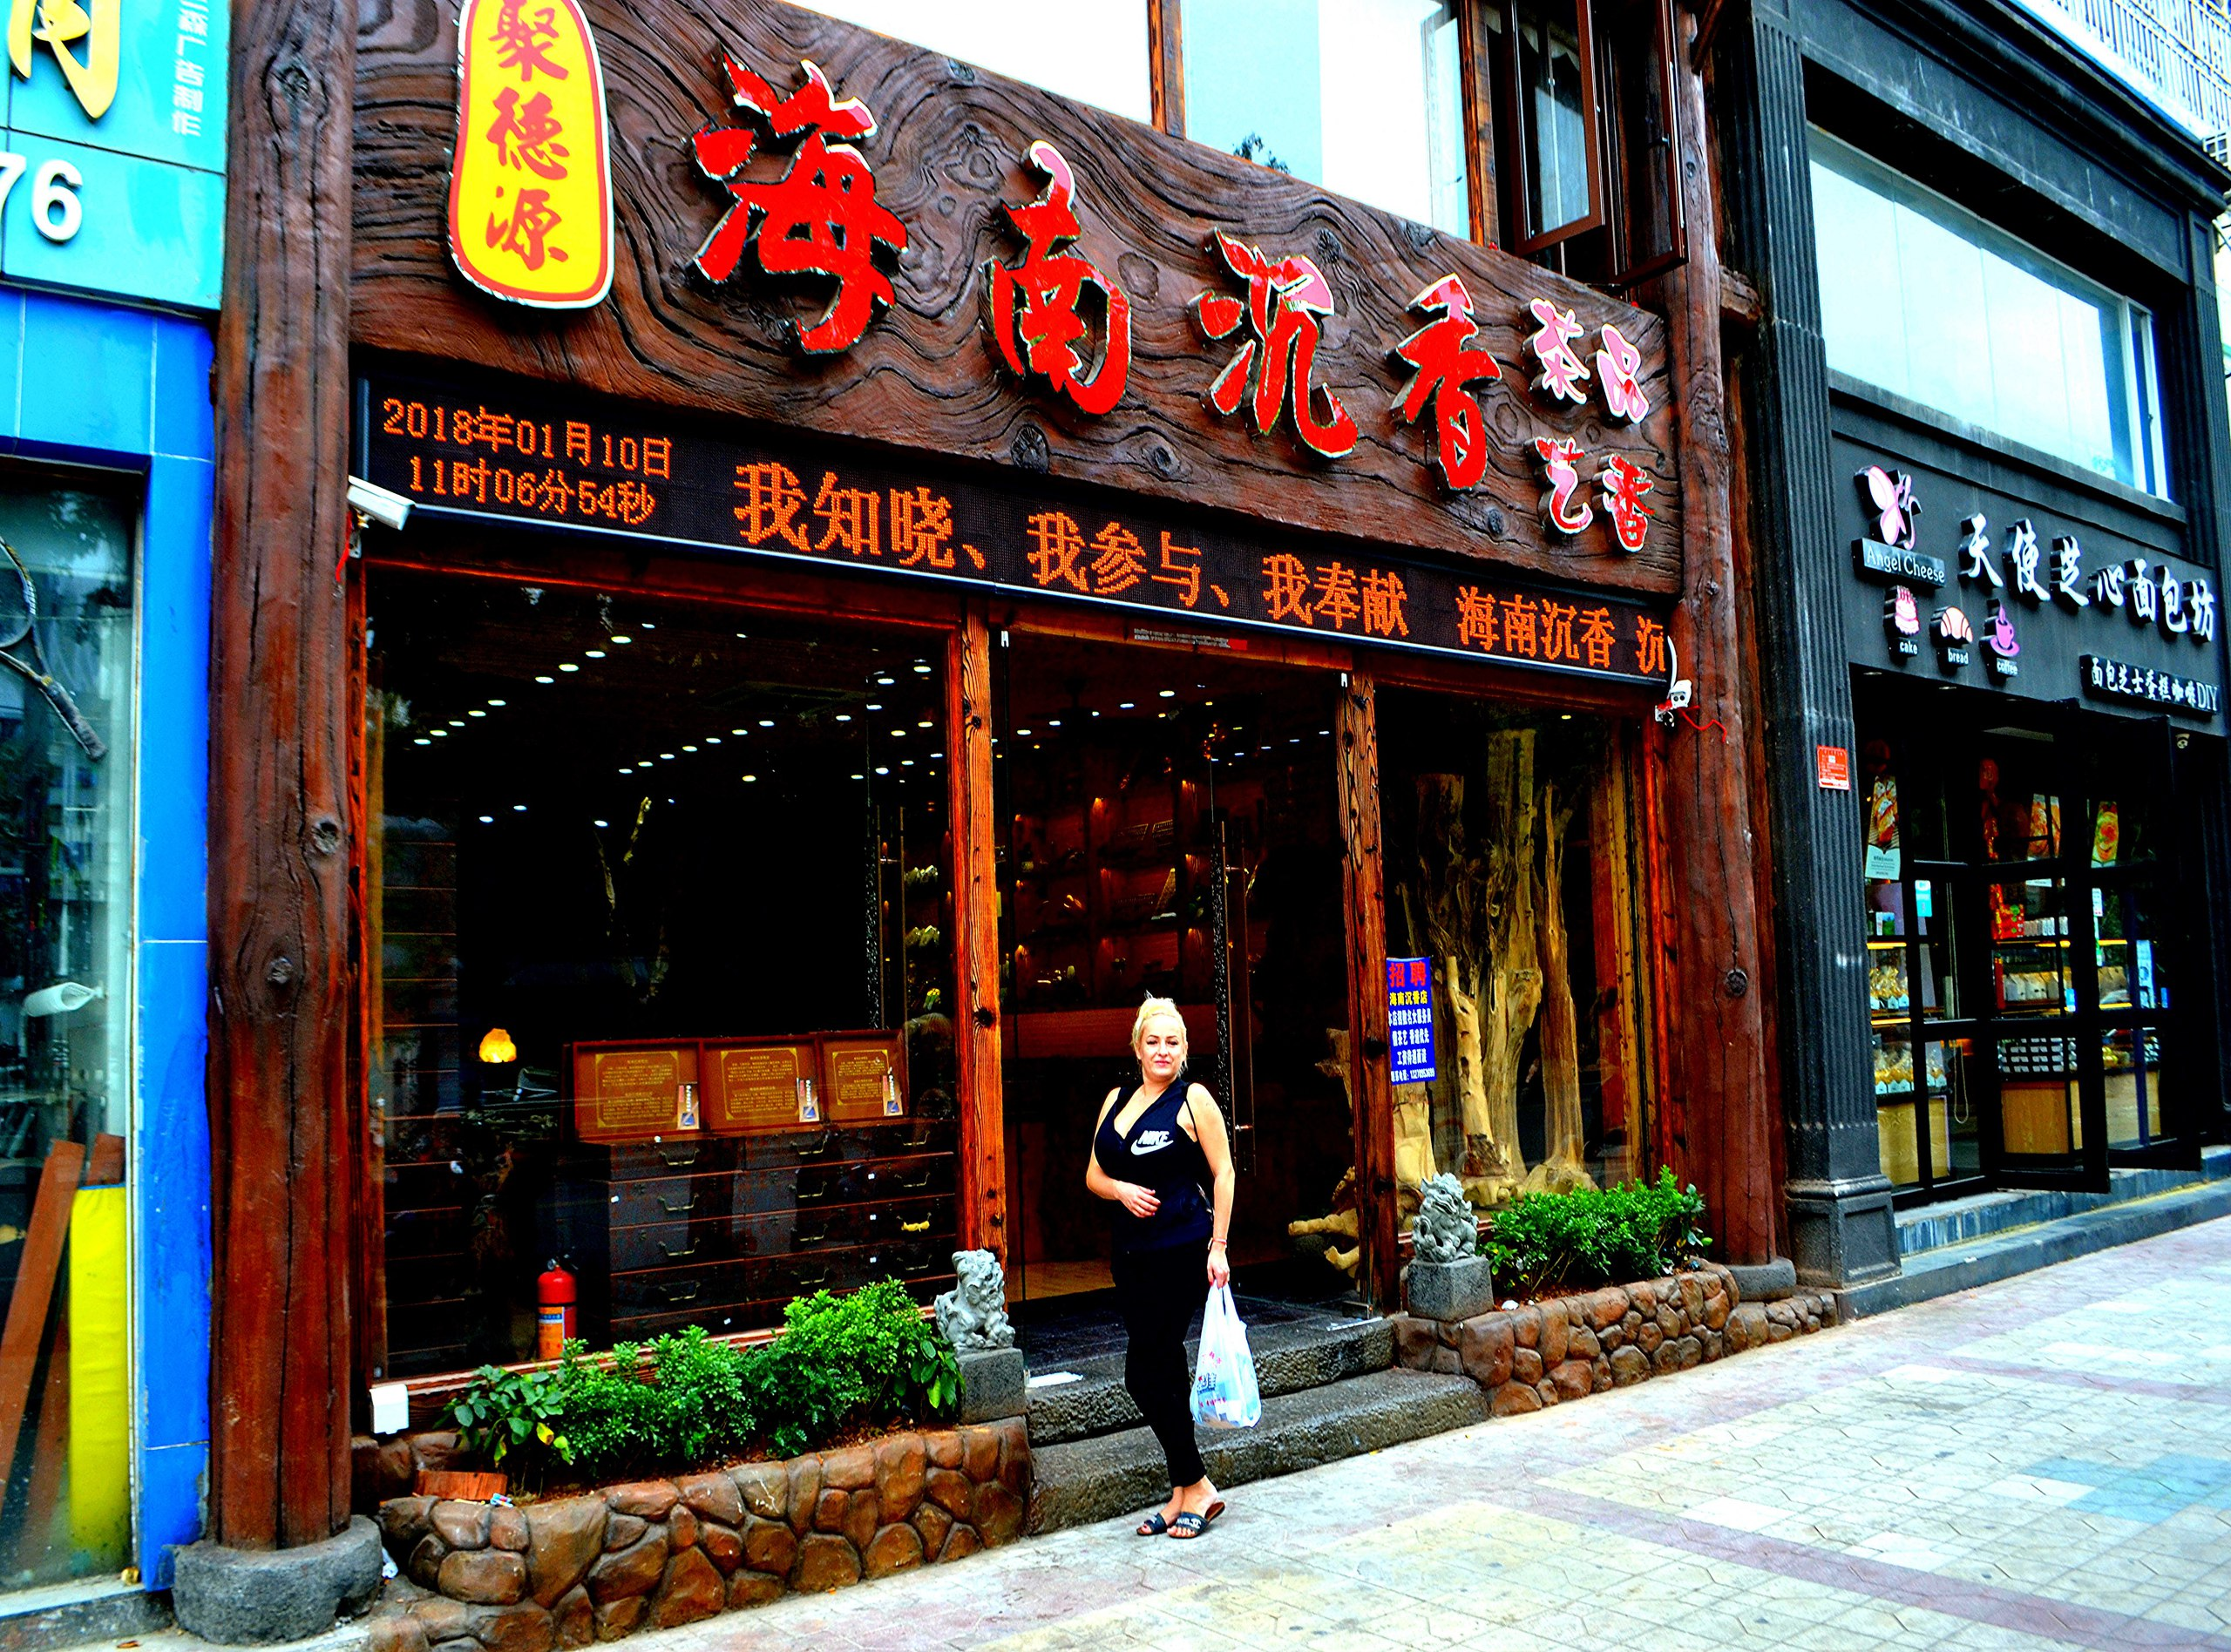 Елена Руденко (Валтея). Китай, о.Хайнань, г.Санья. (фото) - Страница 4 X3RA1PV2YQ4